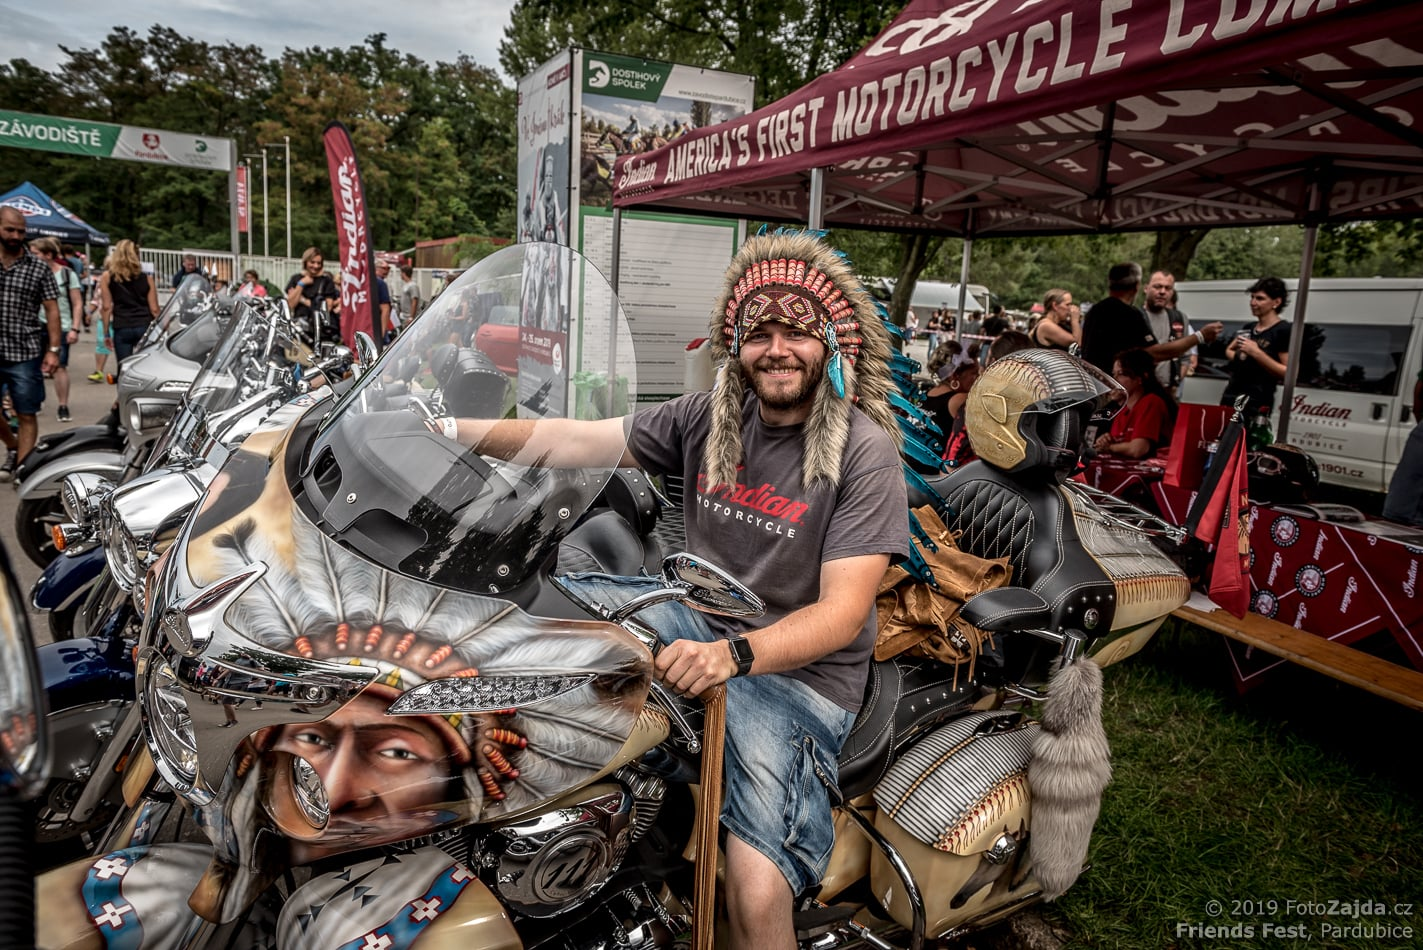 Мотоциклы Harley-Davidson 2017 модельного года | Harley ...